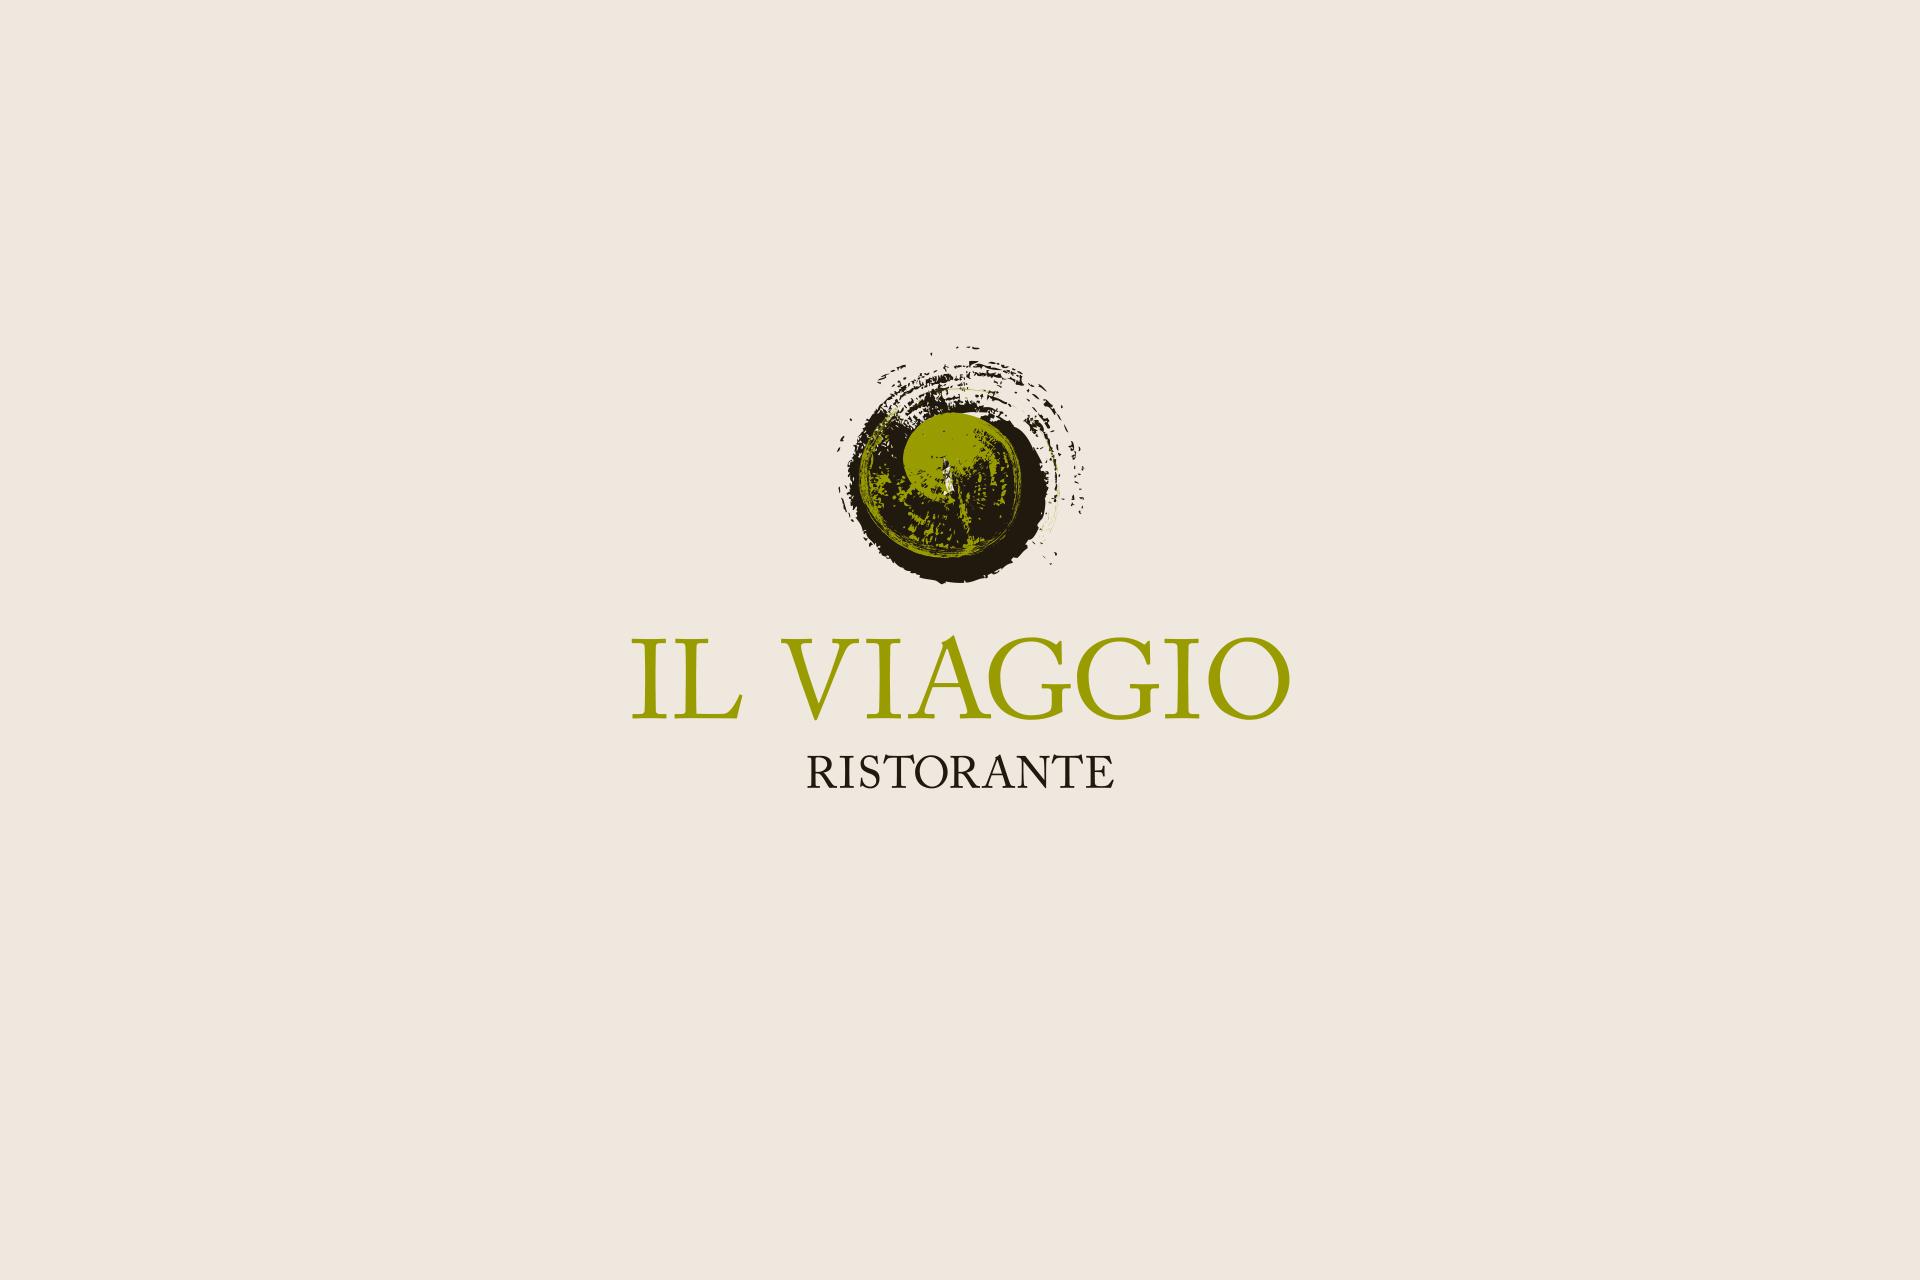 IL Viaggio Ristorante Лого дизайн и визуална комуникация на ресторант